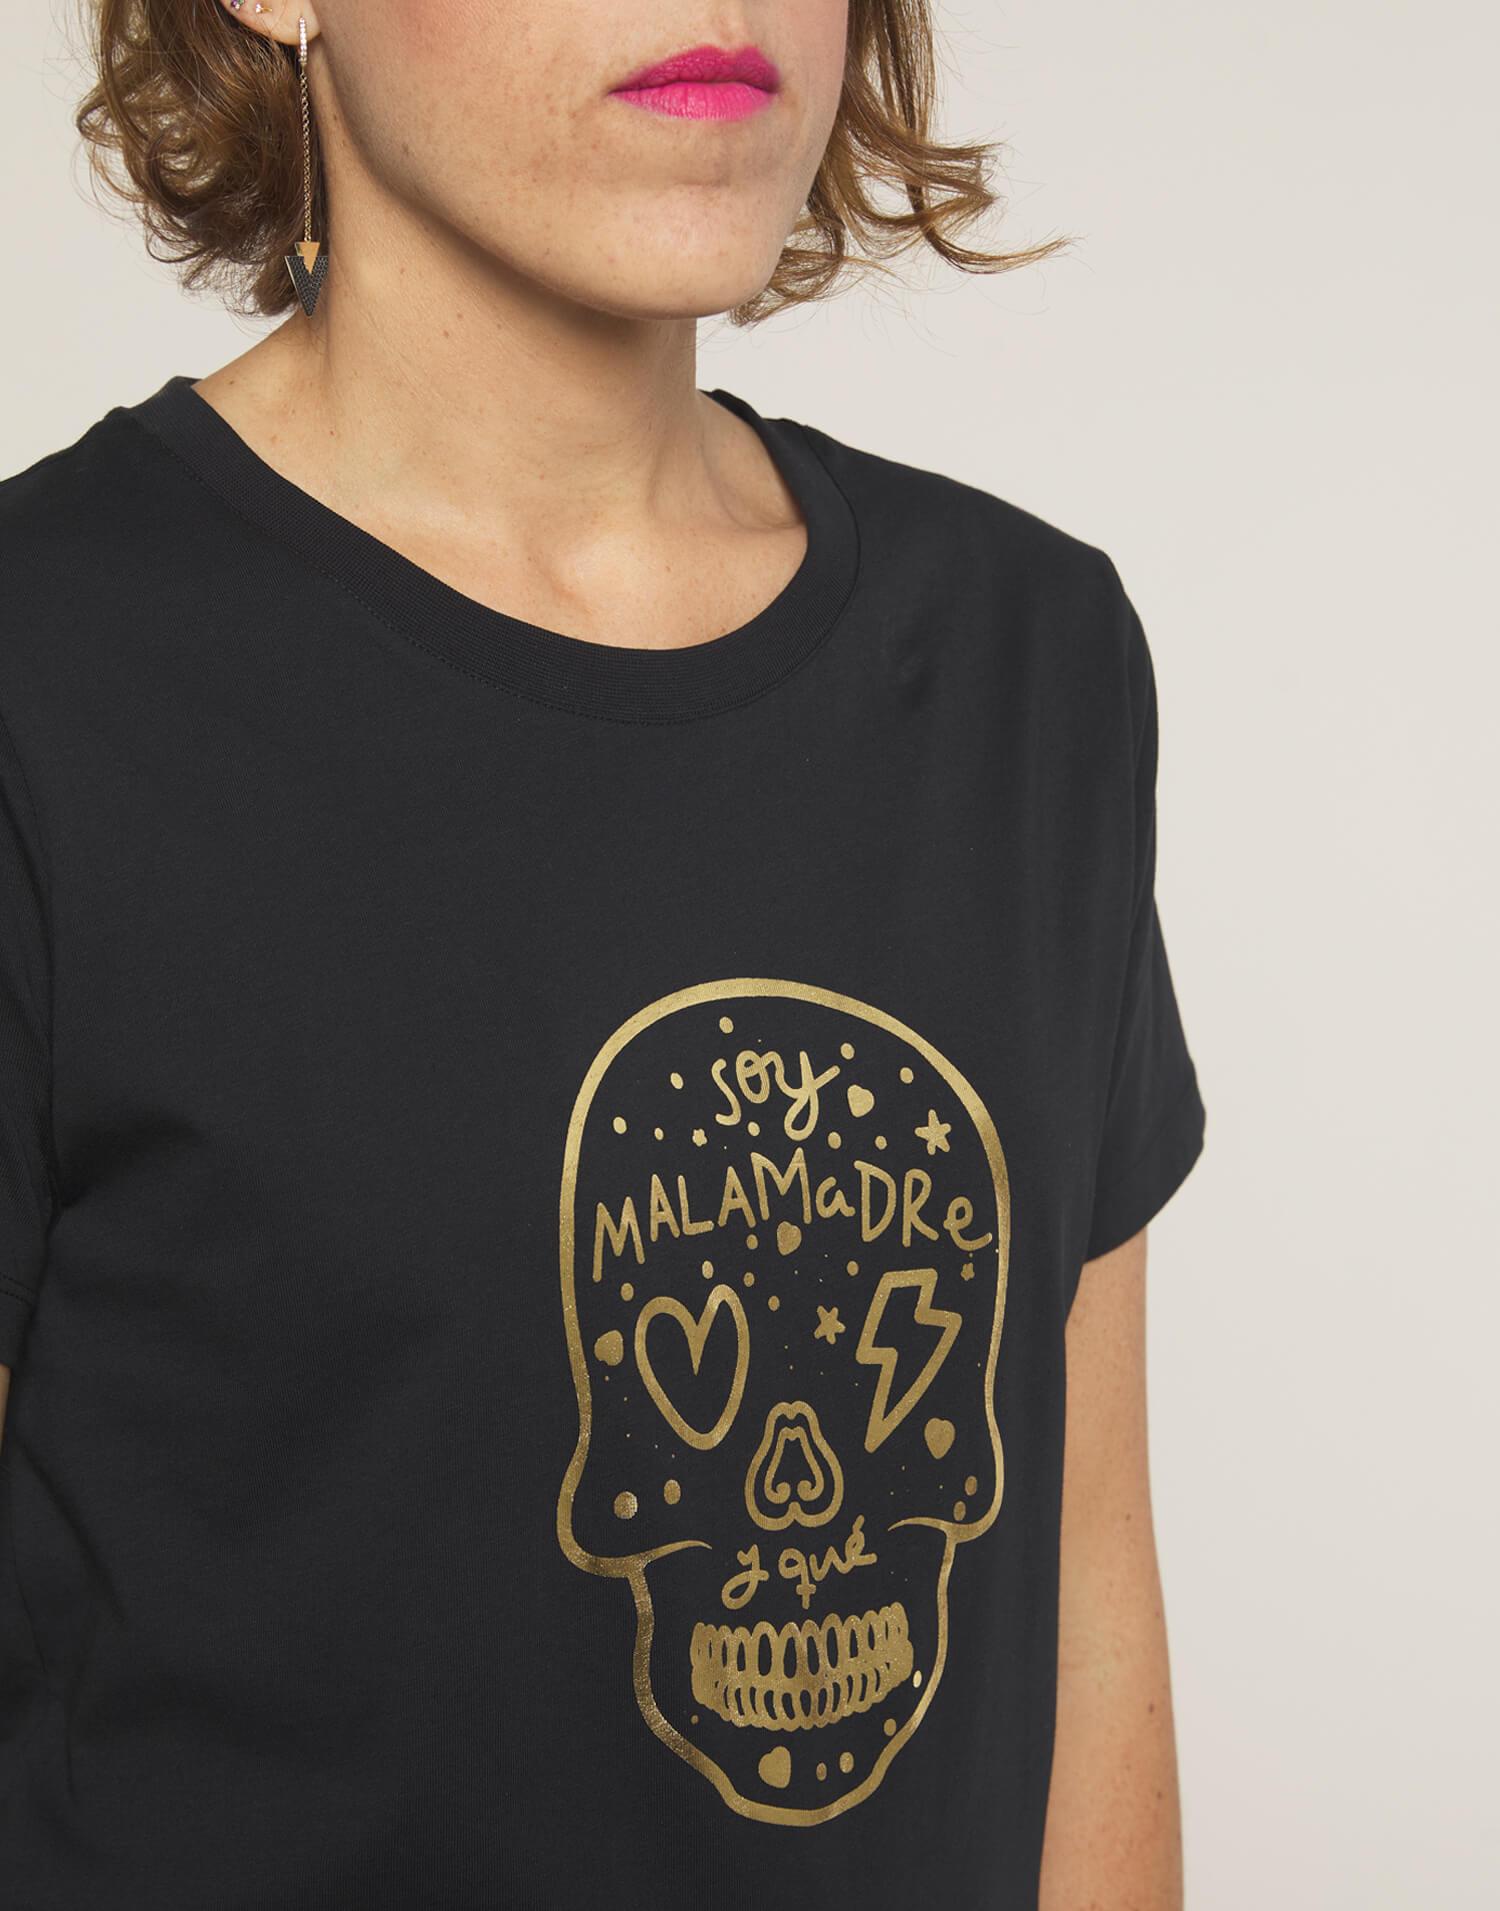 Camiseta calavera dorada